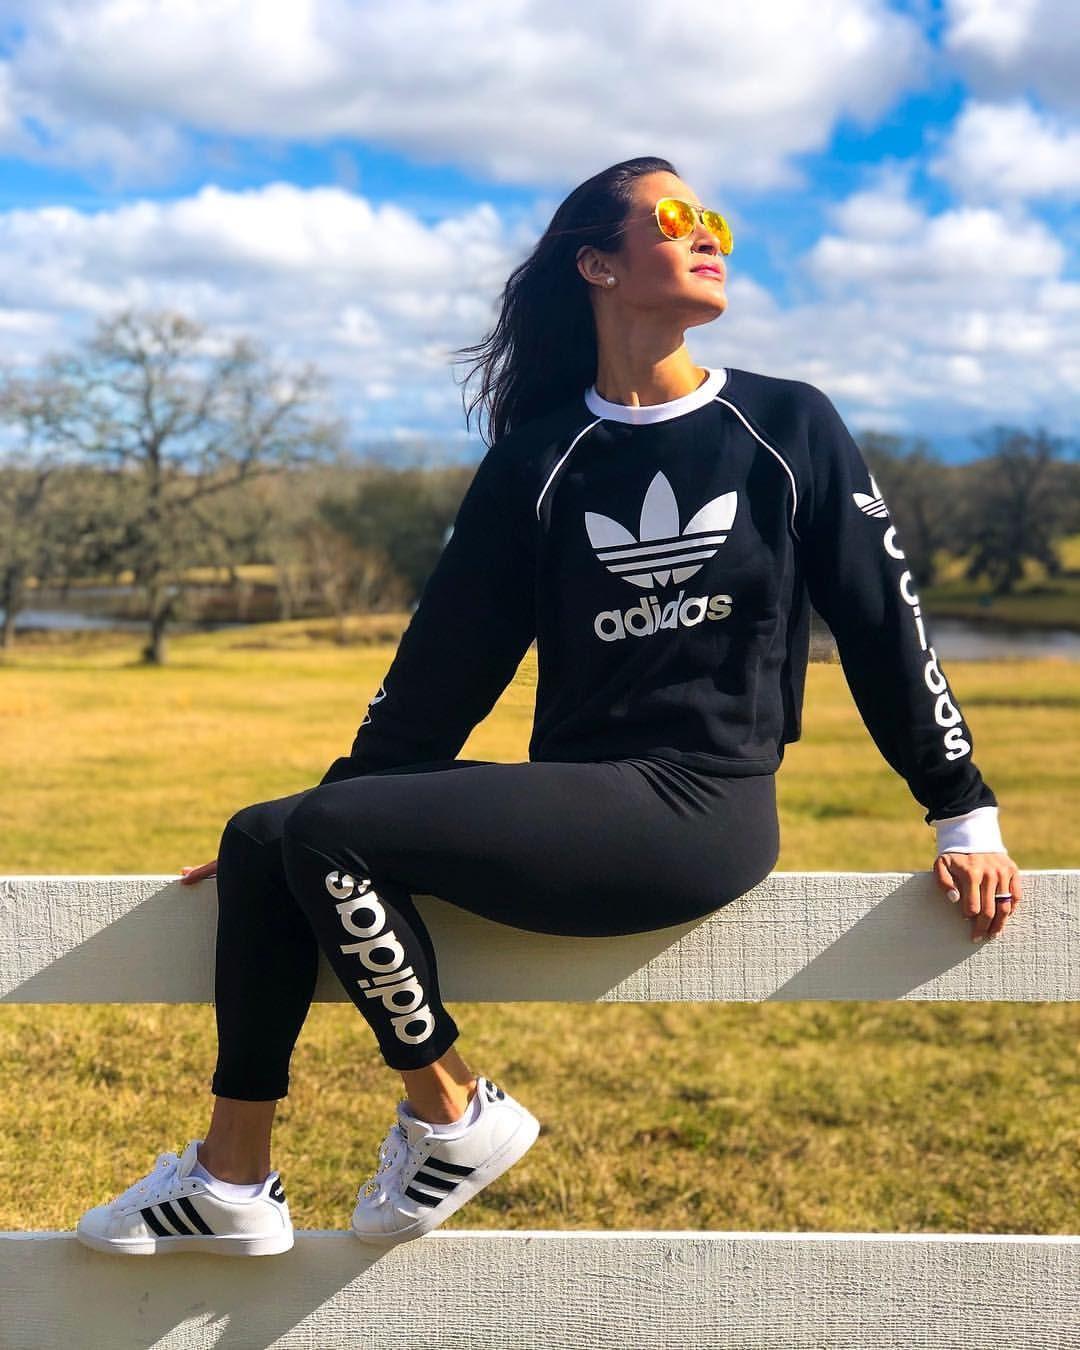 Adidas Adidas Leggings Adidas Sweatshirt Adidas Cloud Foam Shoes Ray Ban Sunglasses Black And White Ahtleisure Work Fitness Fashion Fashion Workout Wear [ 1350 x 1080 Pixel ]